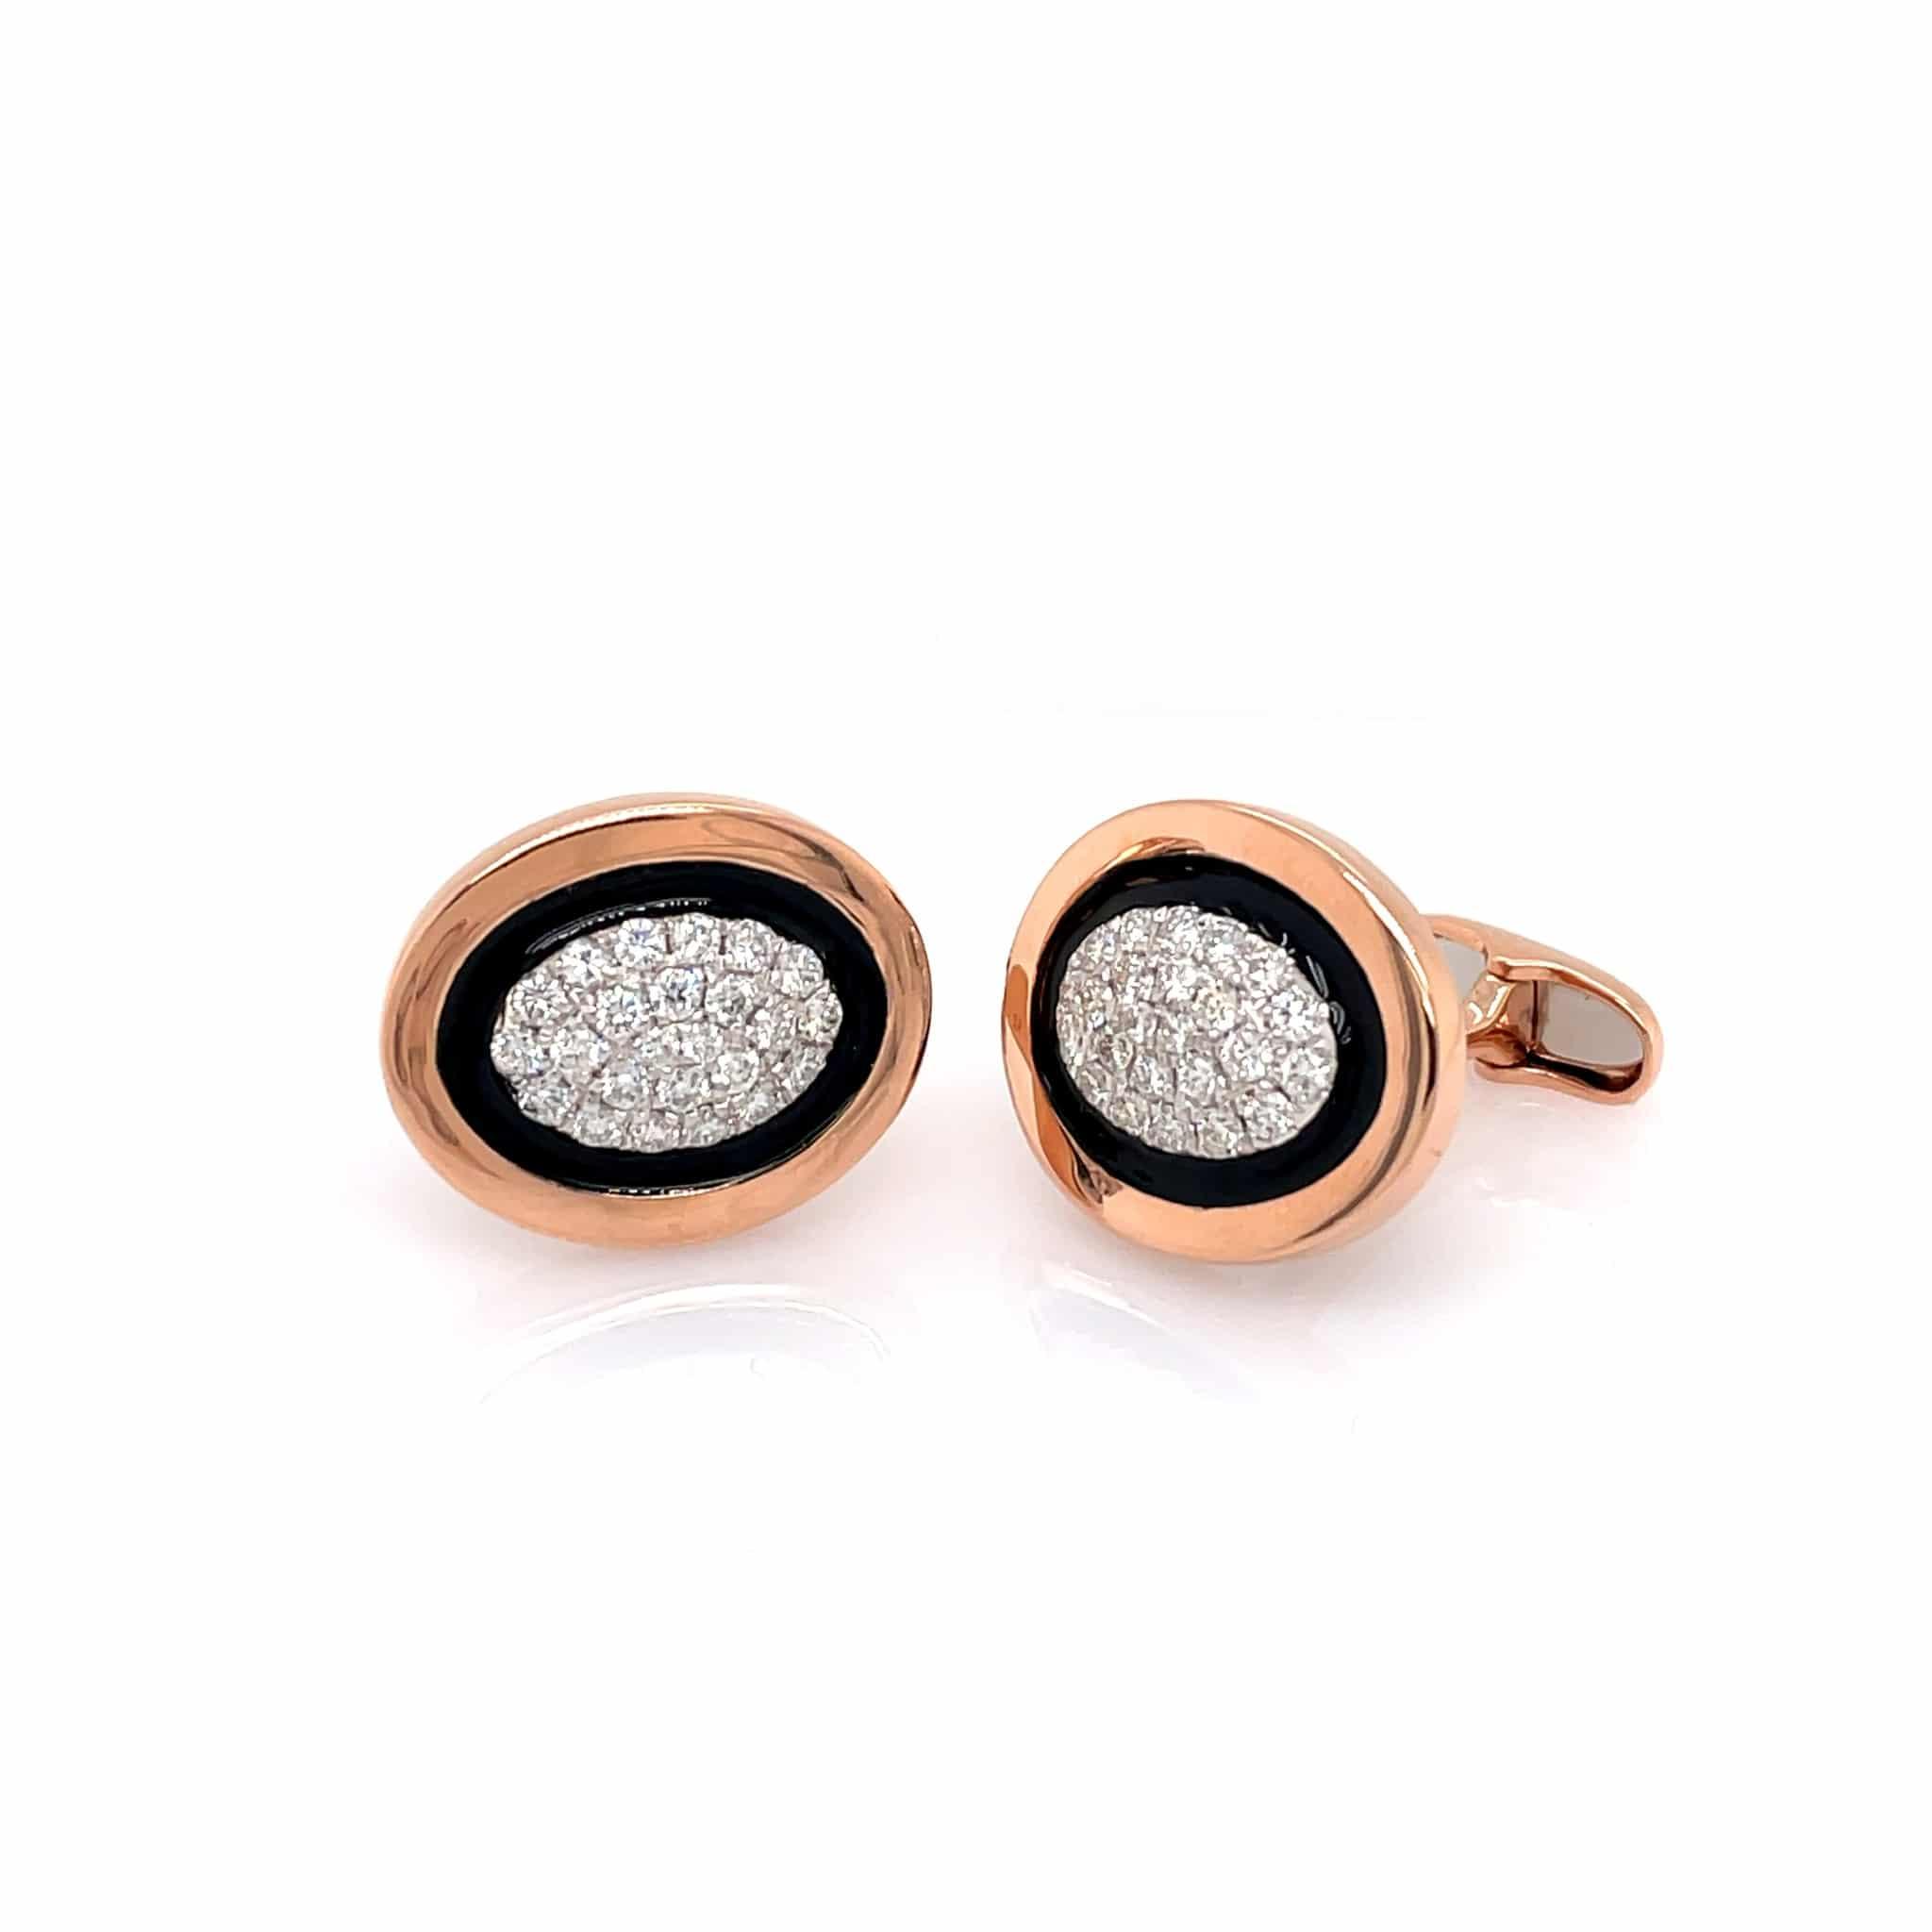 Rose Gold, Black Enamel and Diamond Cufflinks